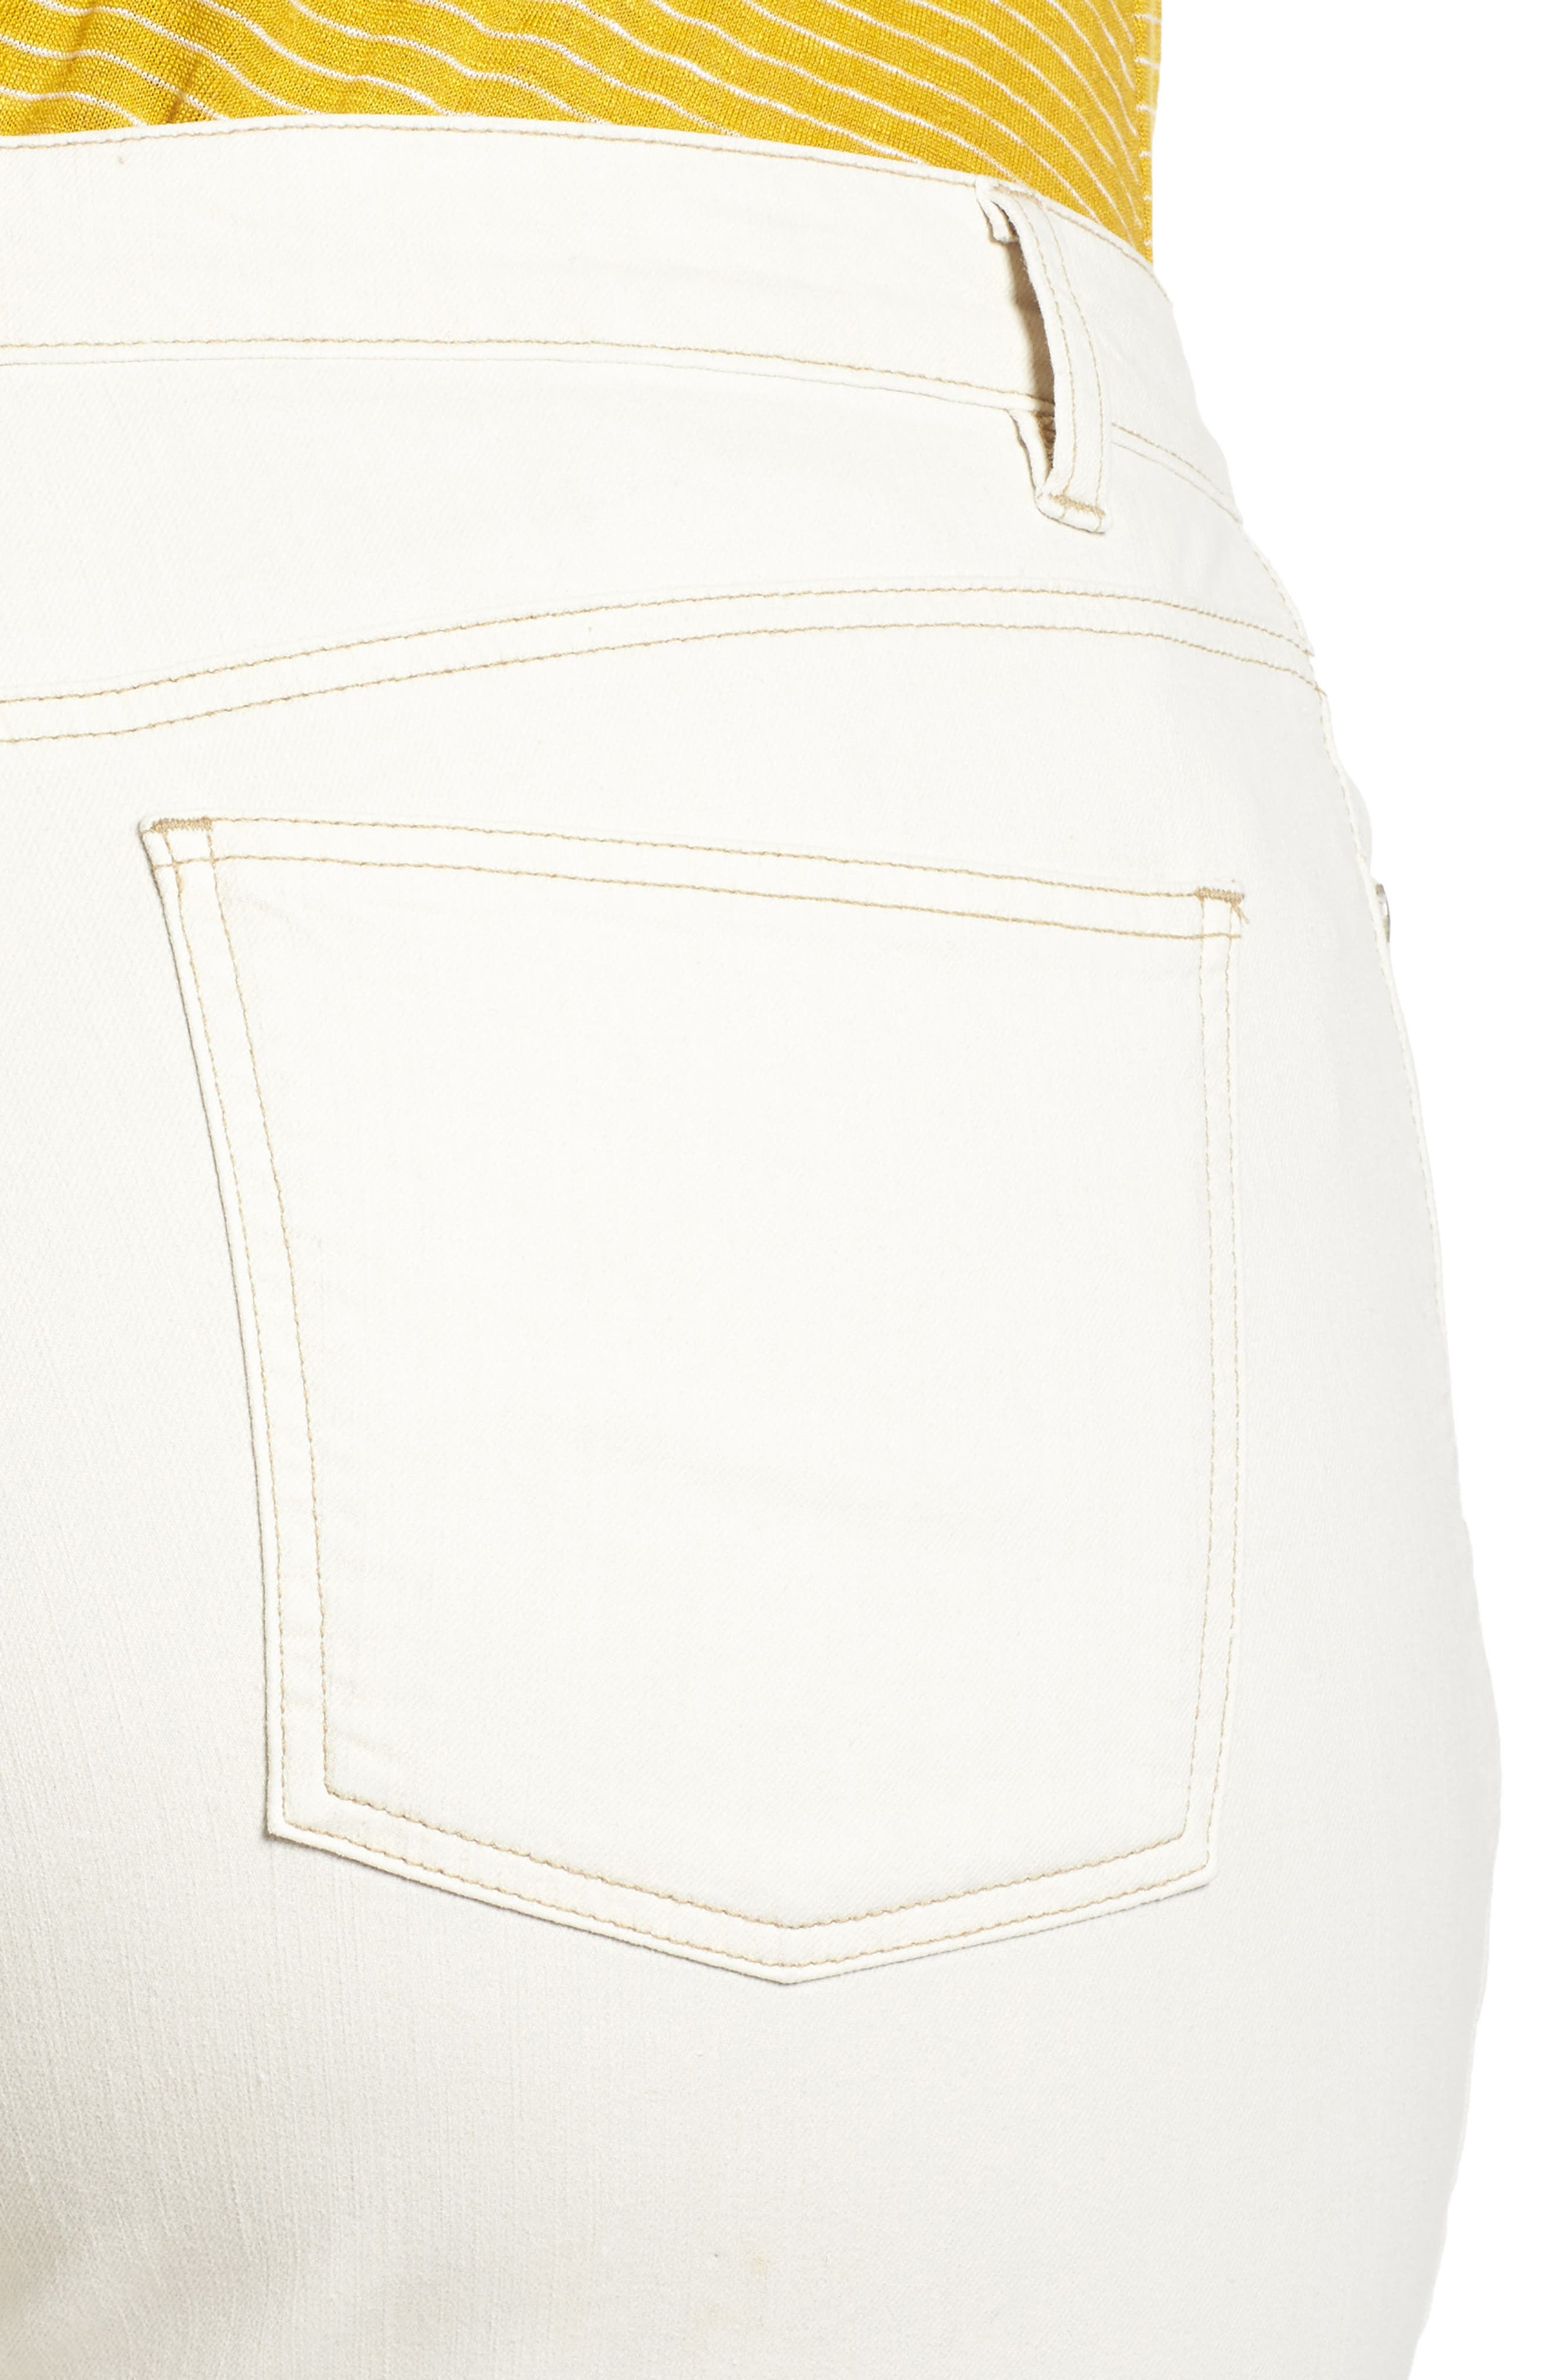 Stretch Organic Denim Crop Jeans,                             Alternate thumbnail 4, color,                             251